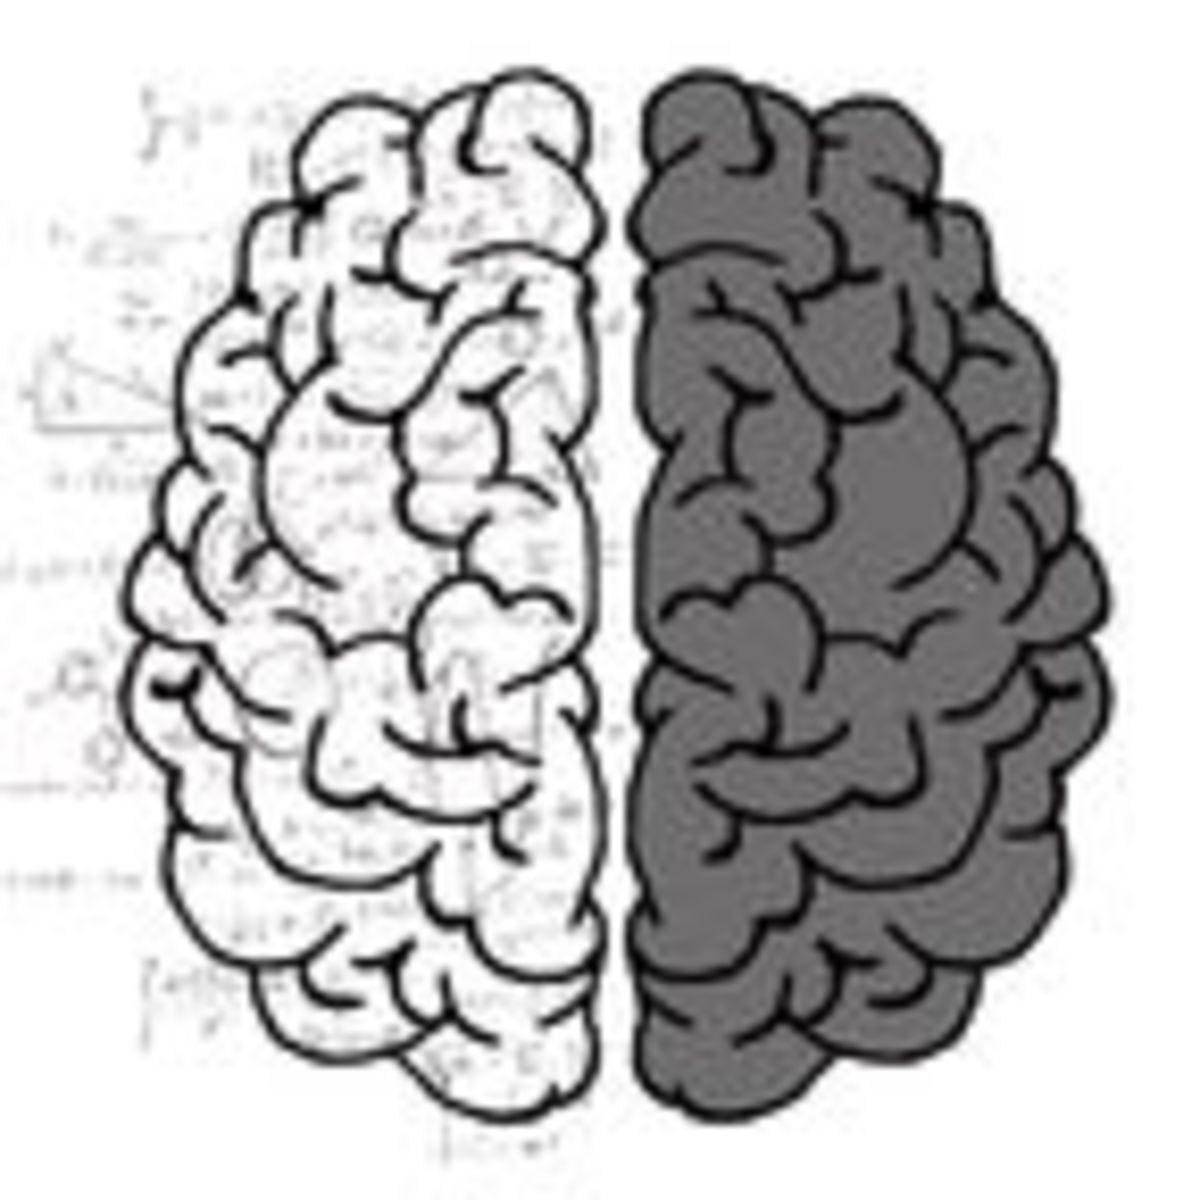 Left Brain-Right Brain Study Debunks a Decades-Old Neuromyth